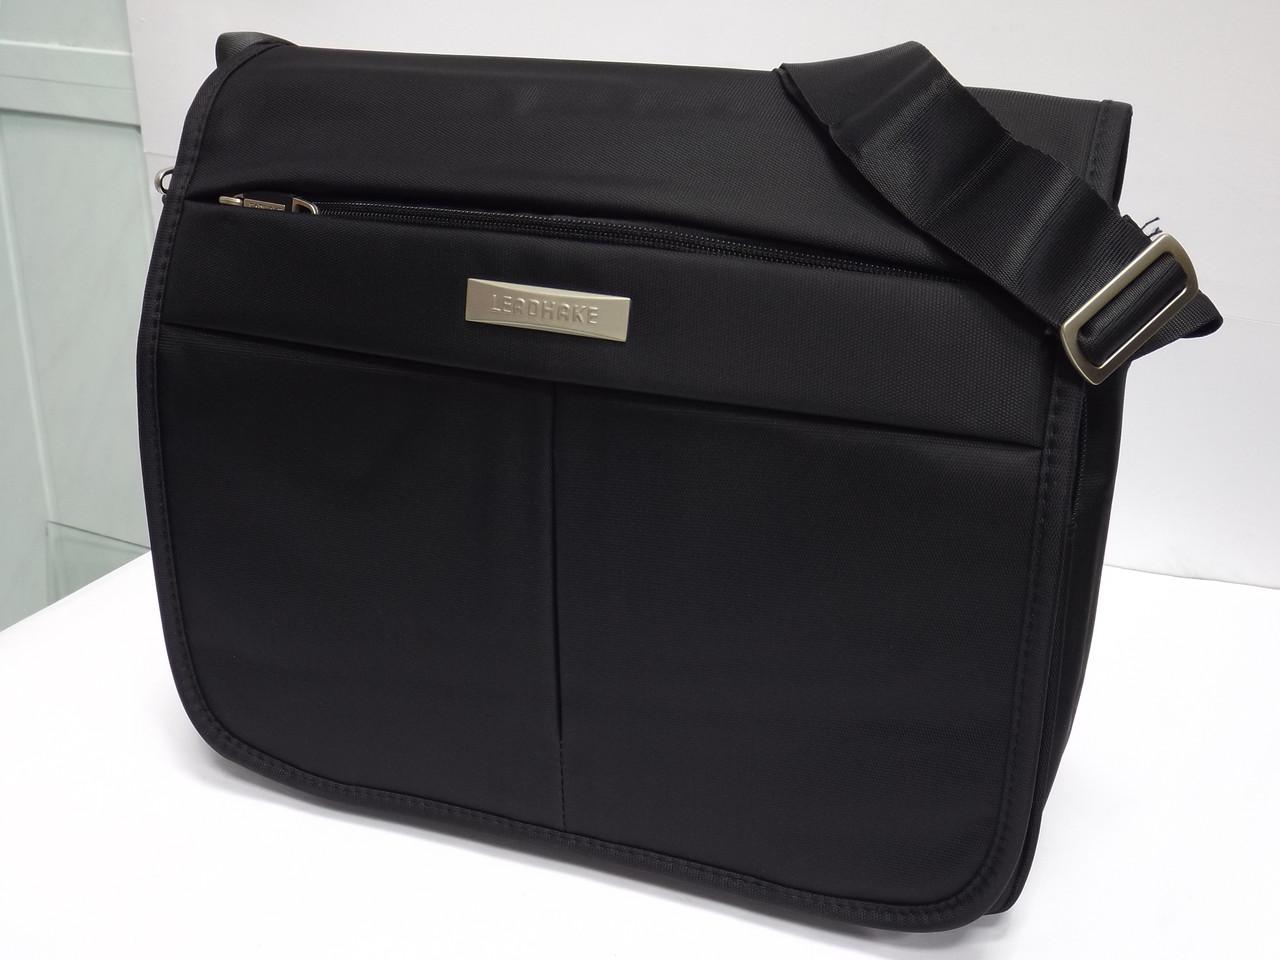 5432fbbe19b4 Мужская текстильная сумка для ноутбука через плечо Leadhake 6212 -  интернет-магазин